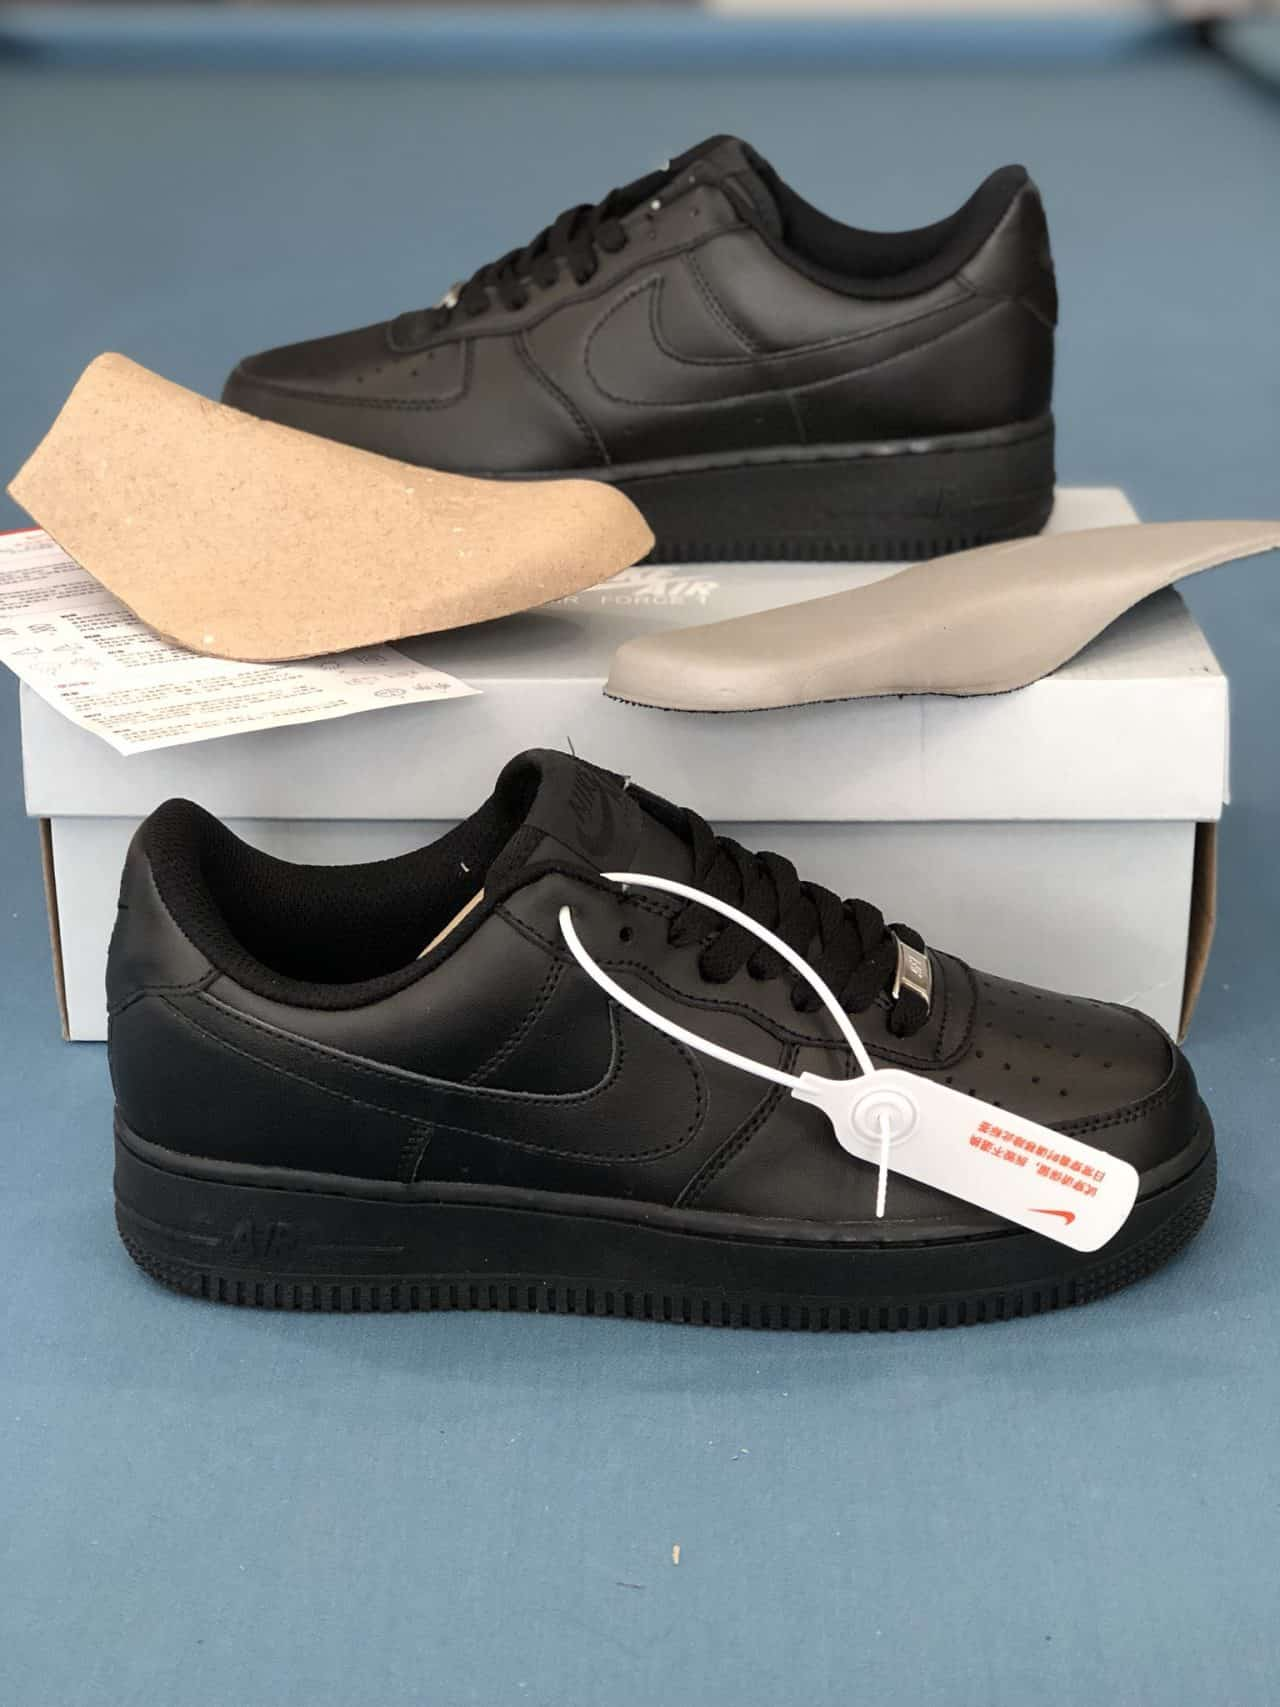 Giày thể thao nam Nike Air Force 1 Full đen Rep 1:1